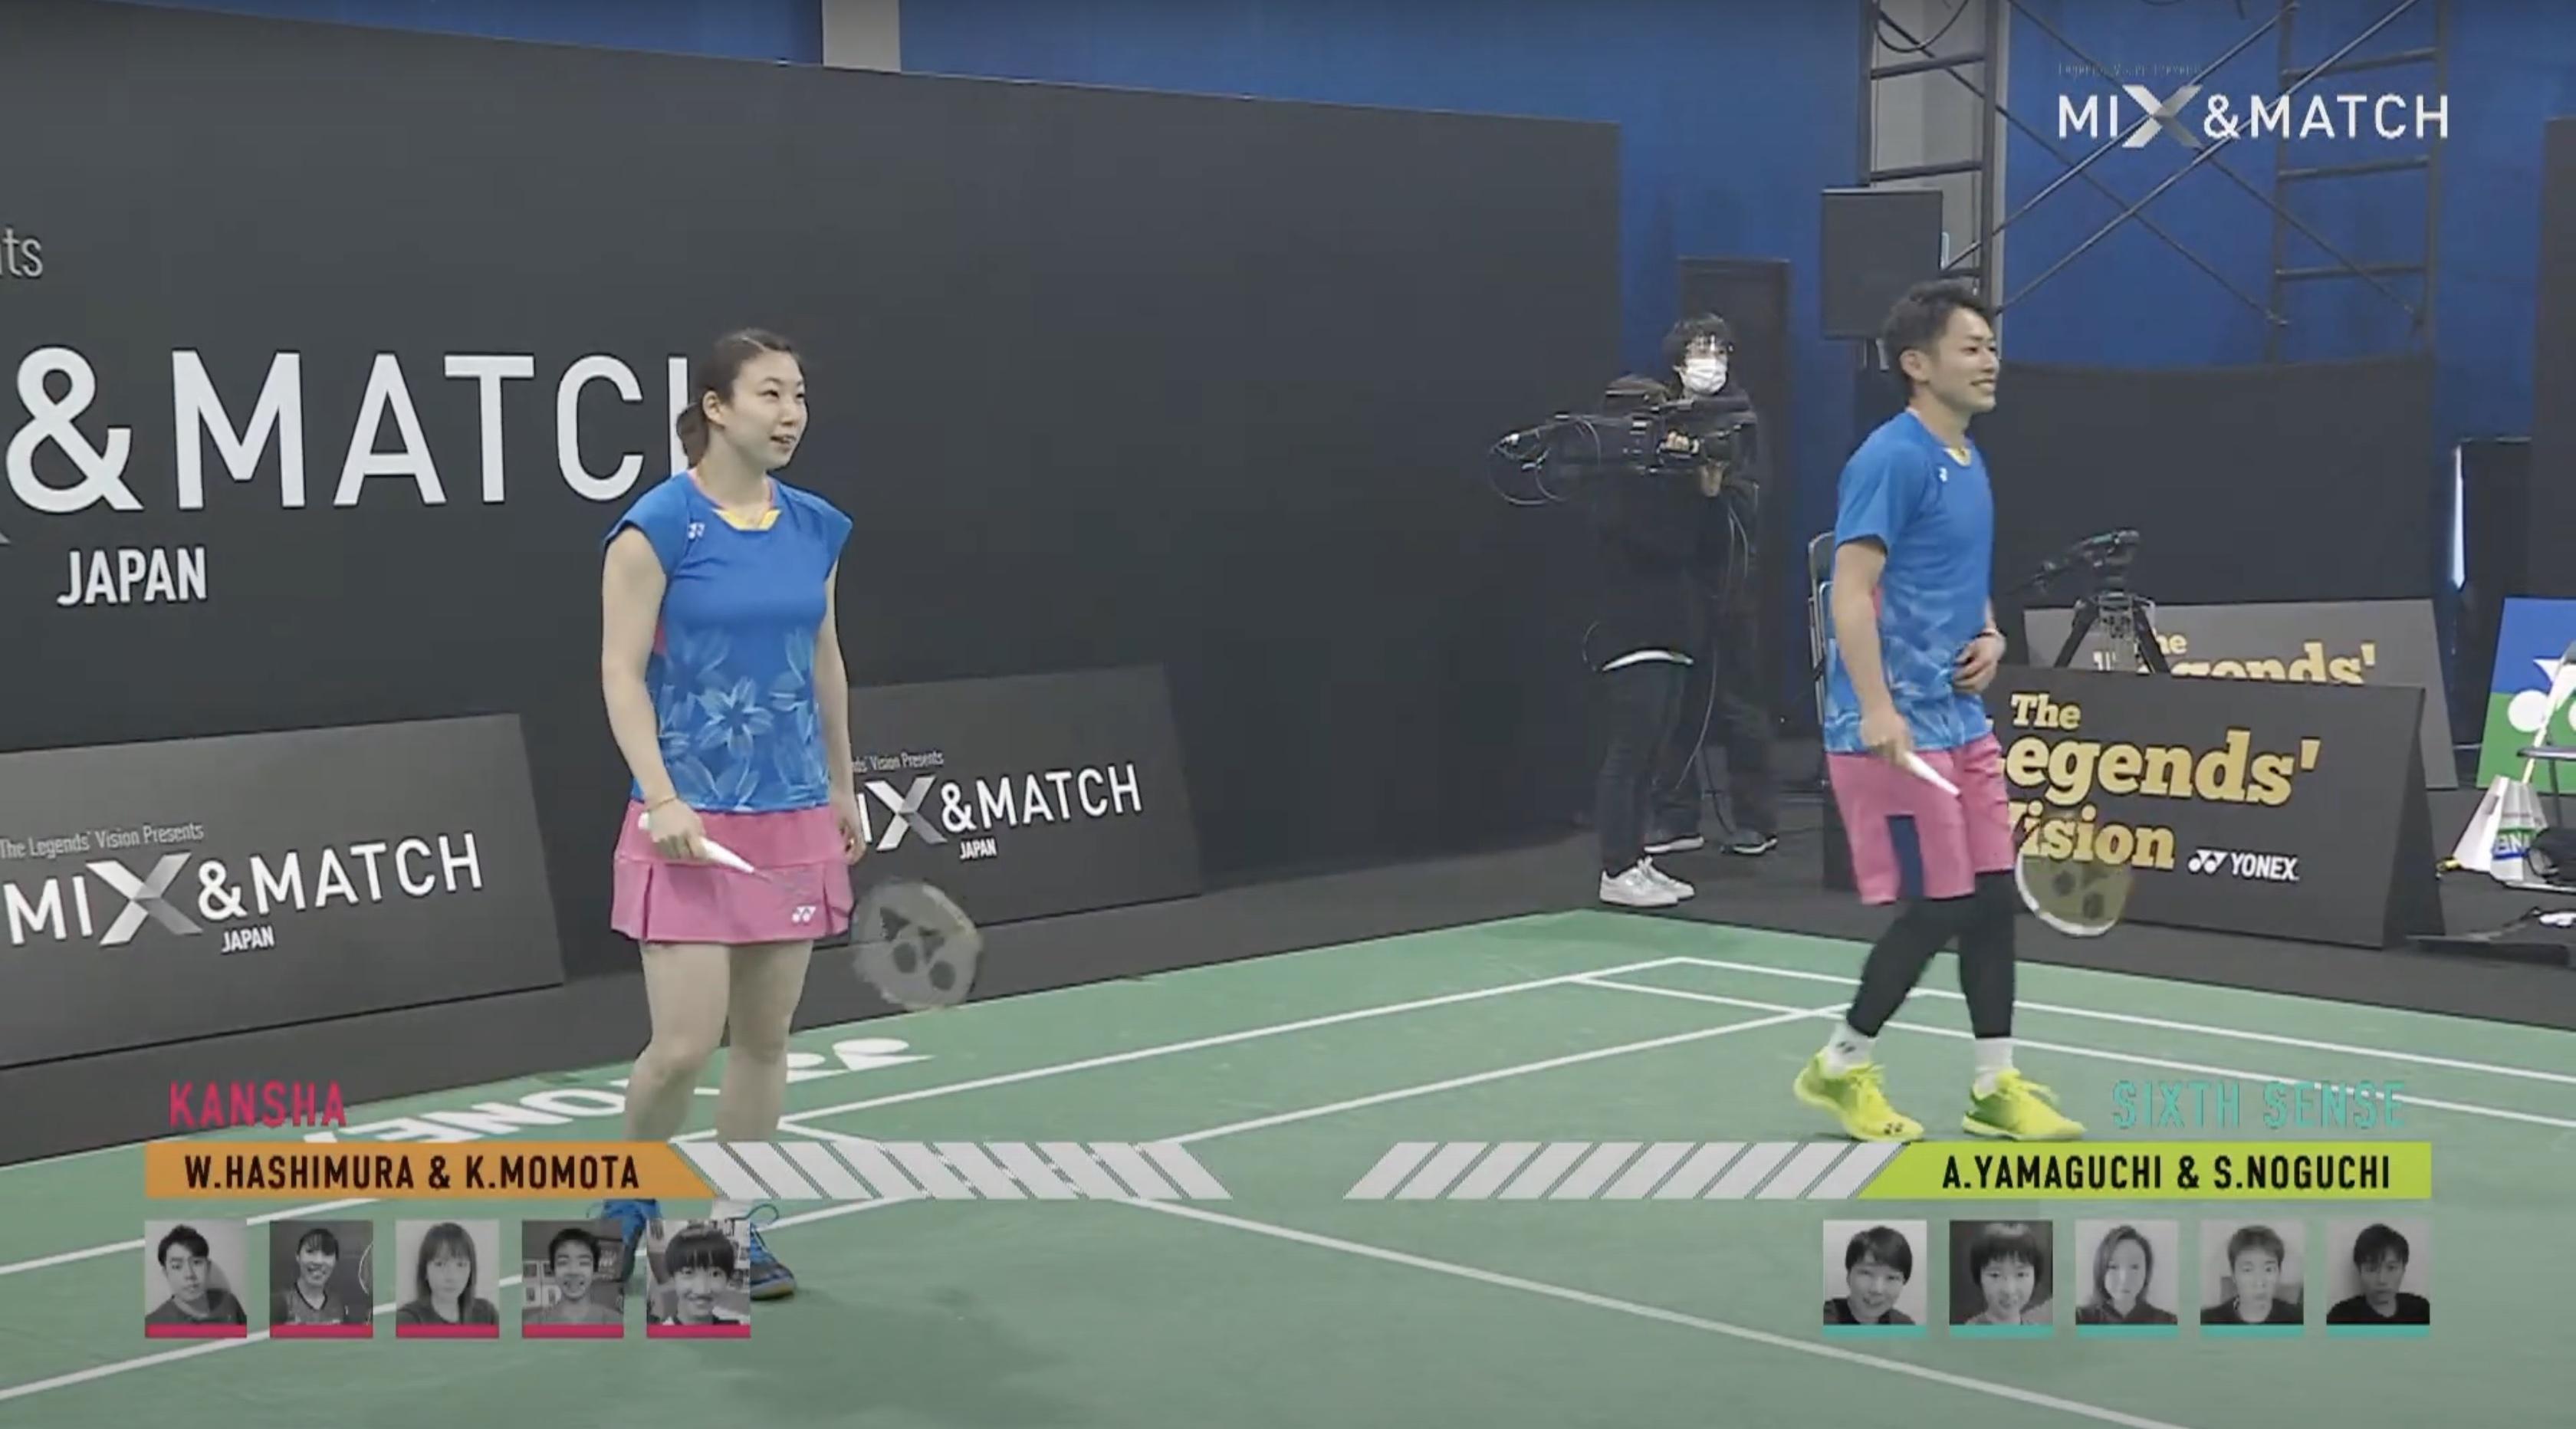 YONEX's New Mix & Match Badminton Challenge - Japan Broadcast